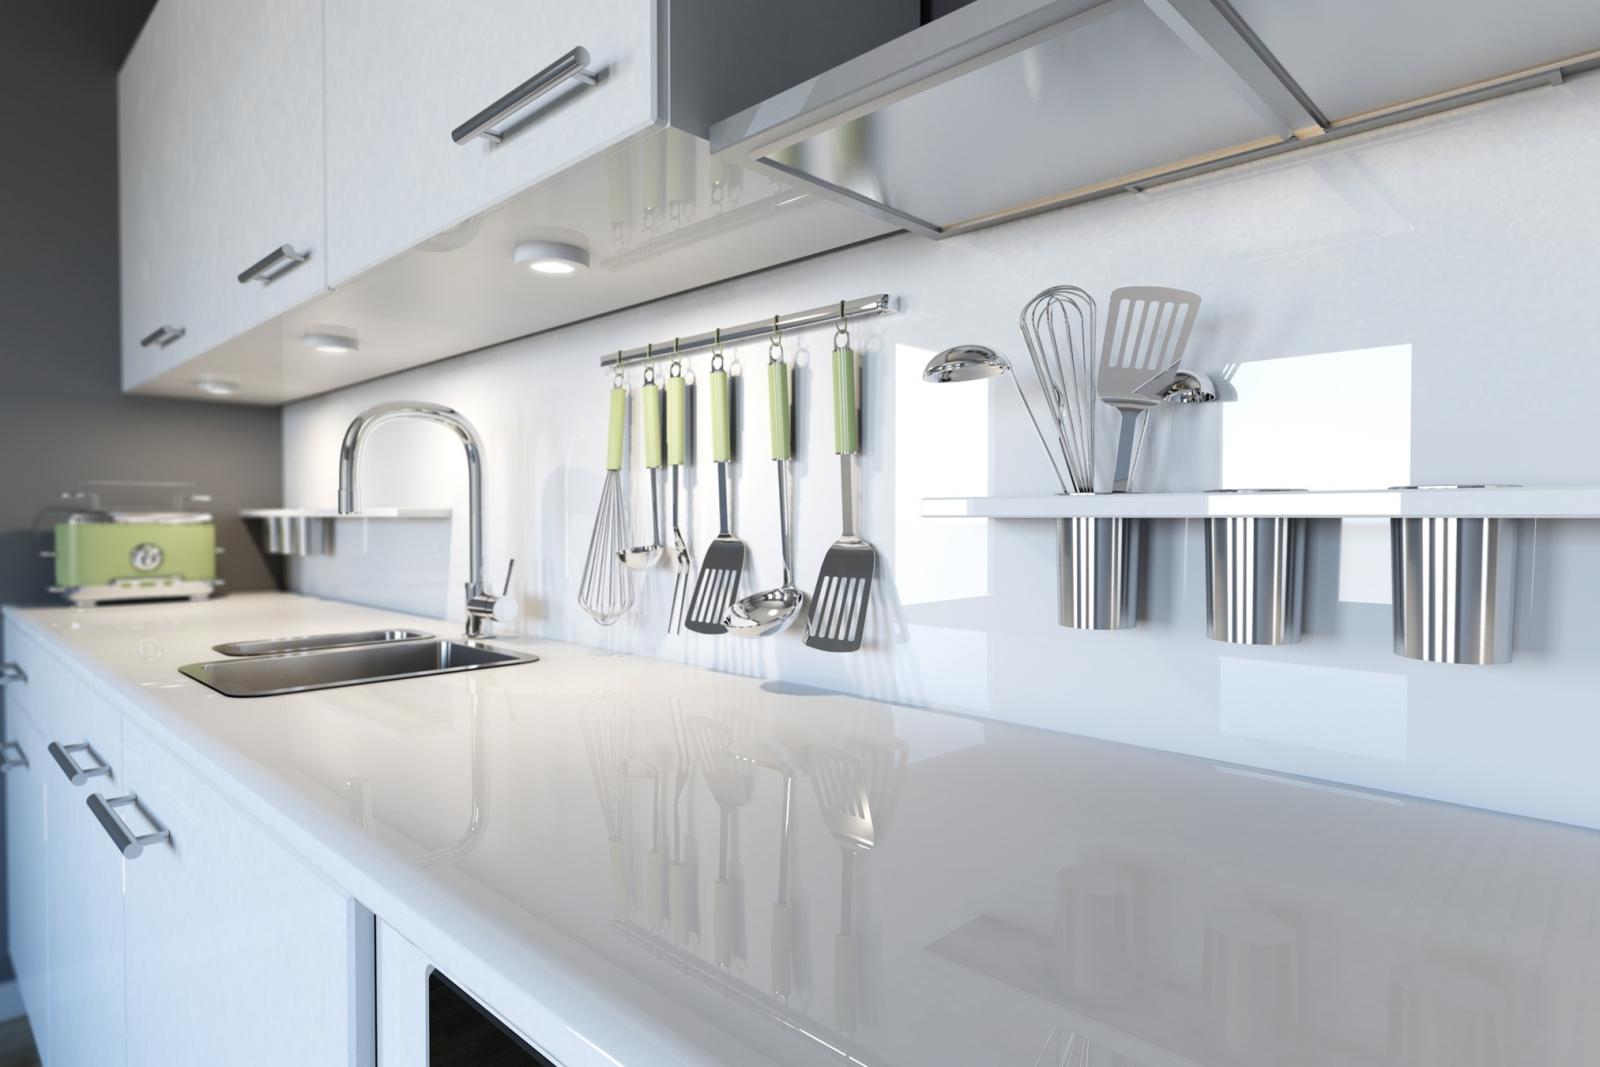 Moderne Keuken Werkblad: Moderne keuken in amsterdam met houten ...